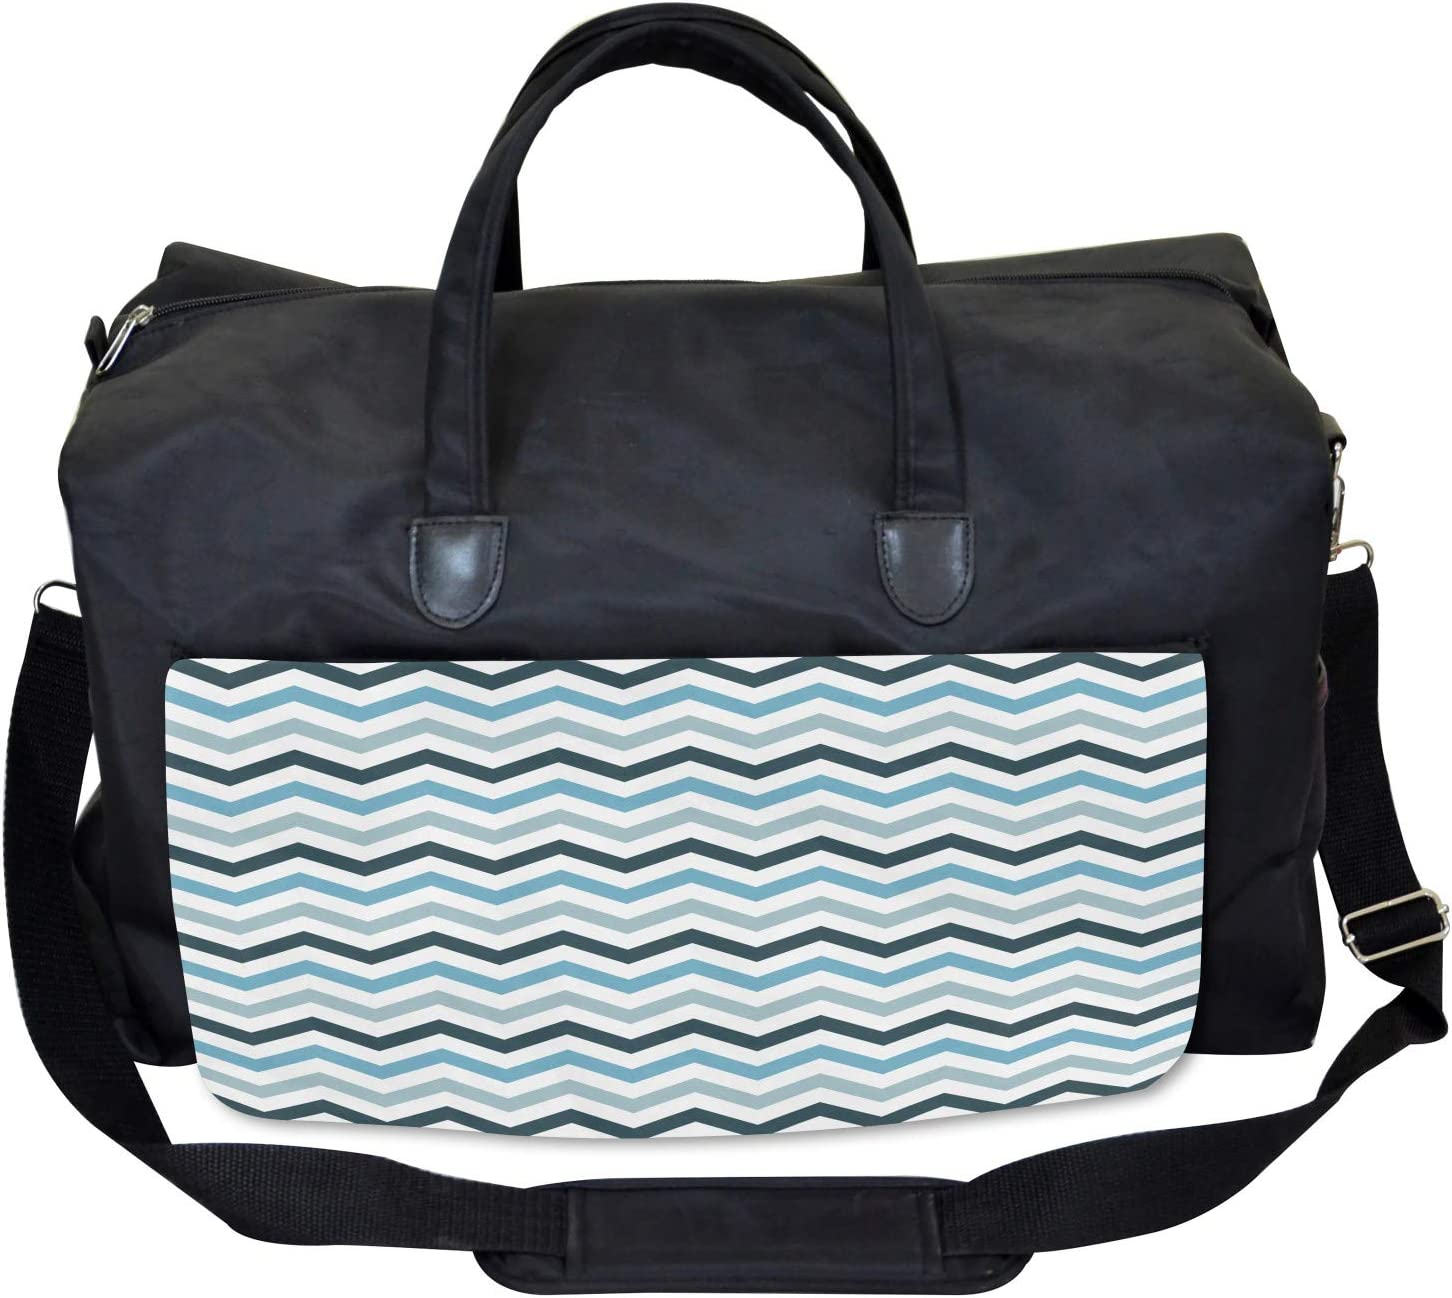 Ambesonne Blue Gym Bag Large Weekender Carry-on Ocean Zig Zag Chevron Line